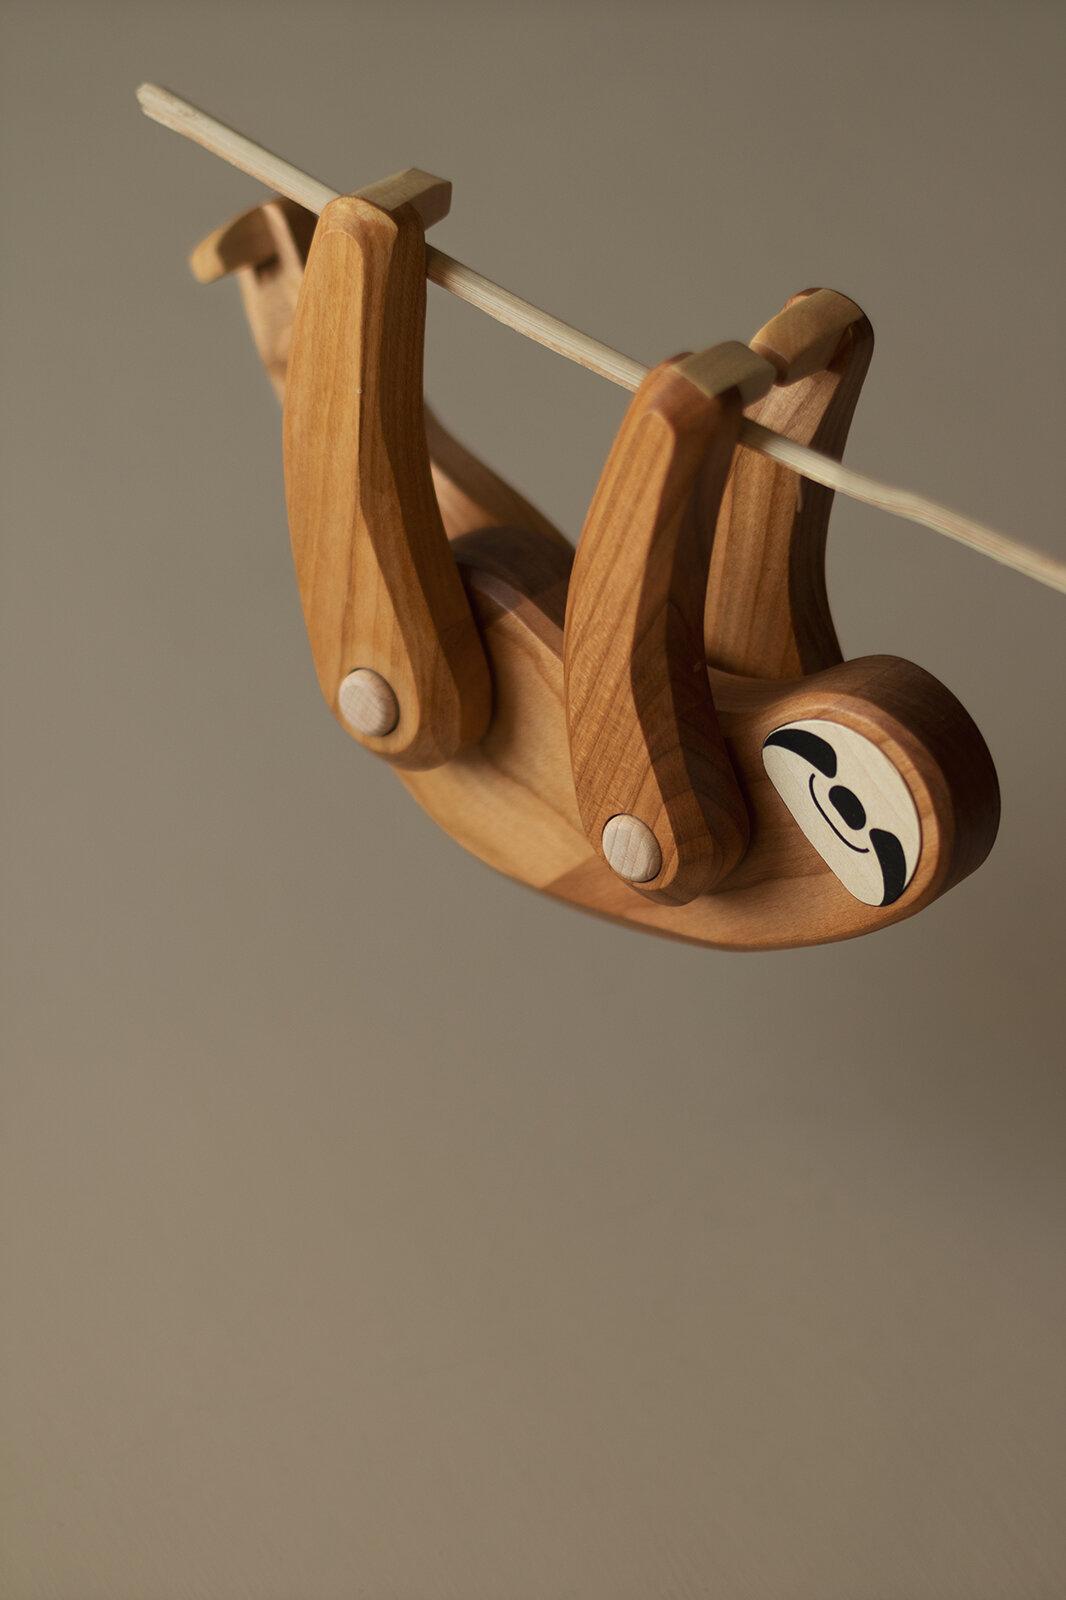 endangered_animals_woodentoy_sloth.jpg